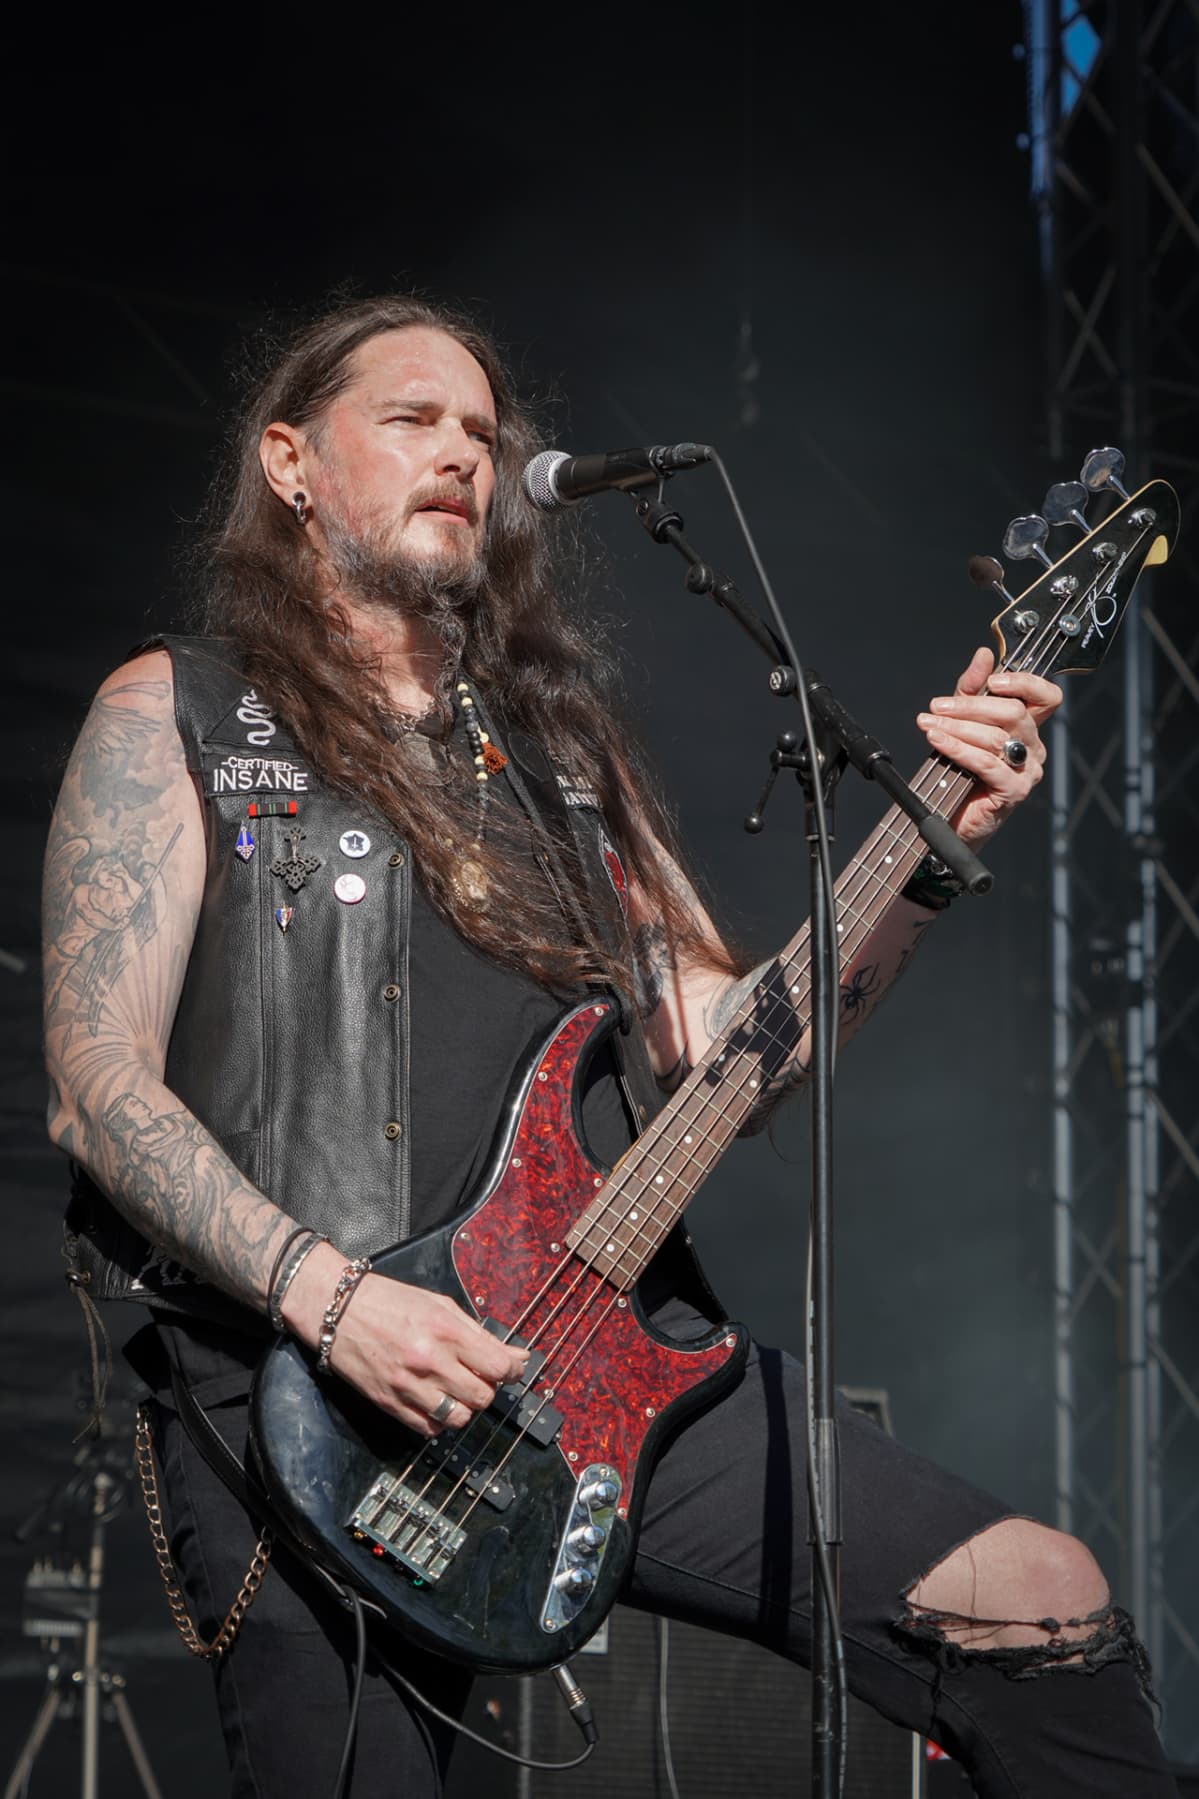 Arkhon Infaustus, Steelfest, black metal